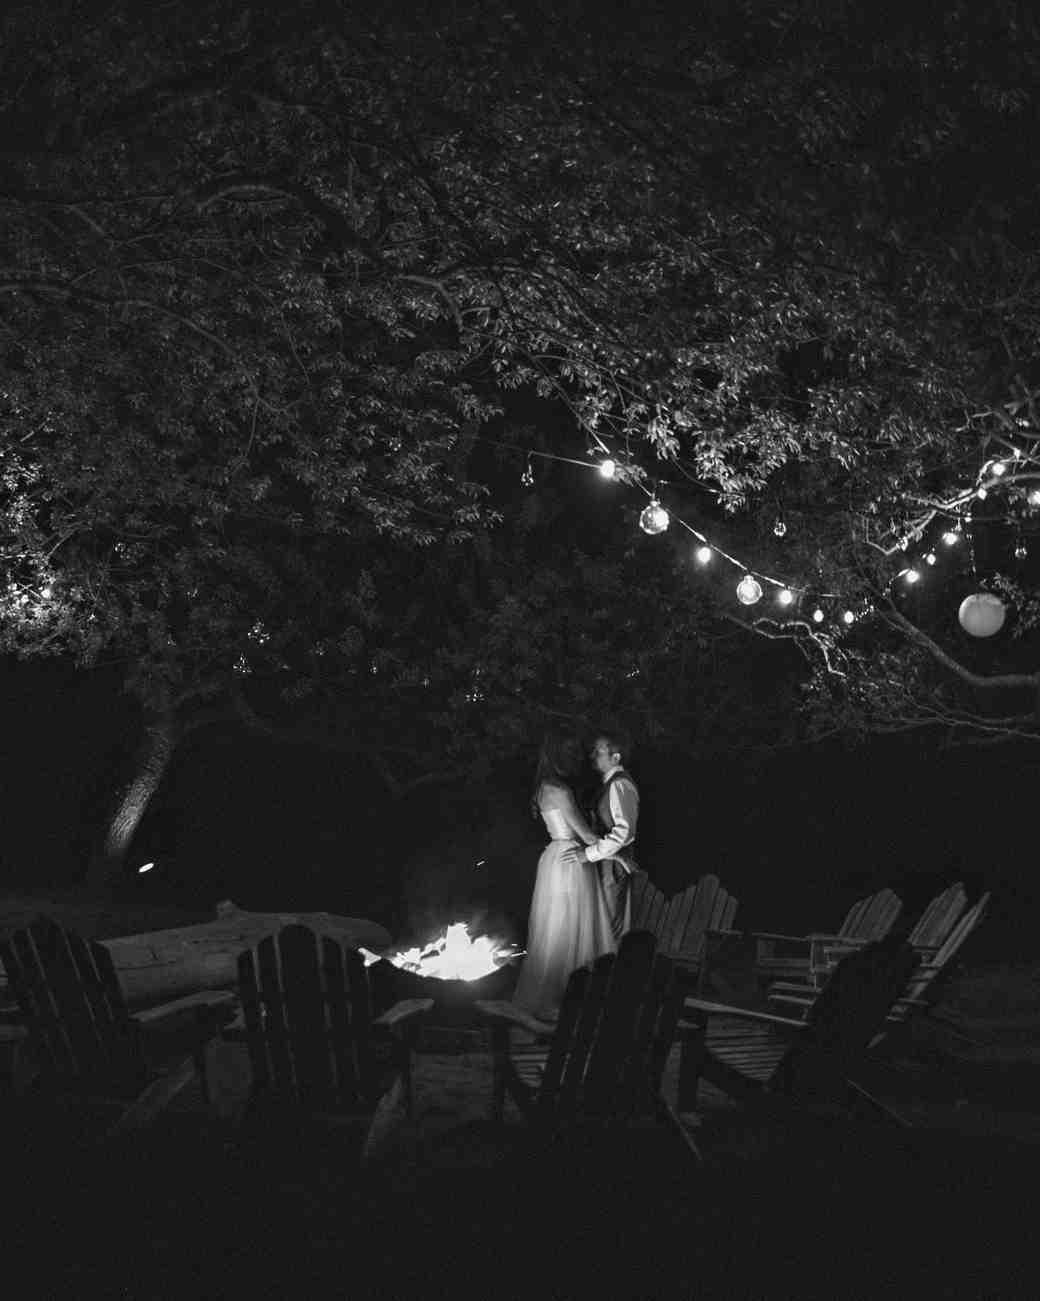 casey-ross-wedding-night-931-s111514-1114.jpg